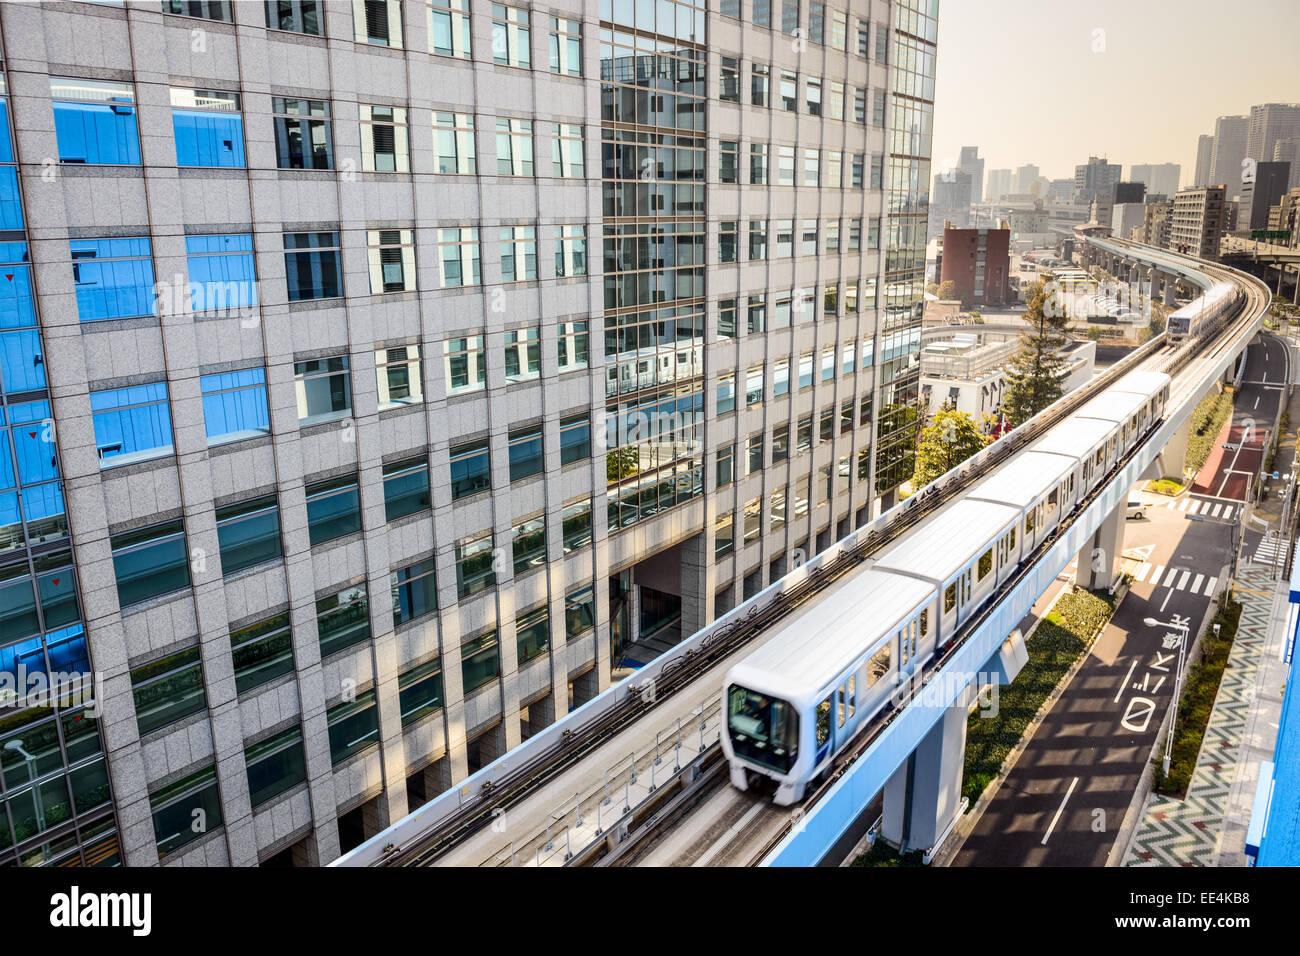 Yurikamome Monorail in Tokyo, Japan. - Stock Image